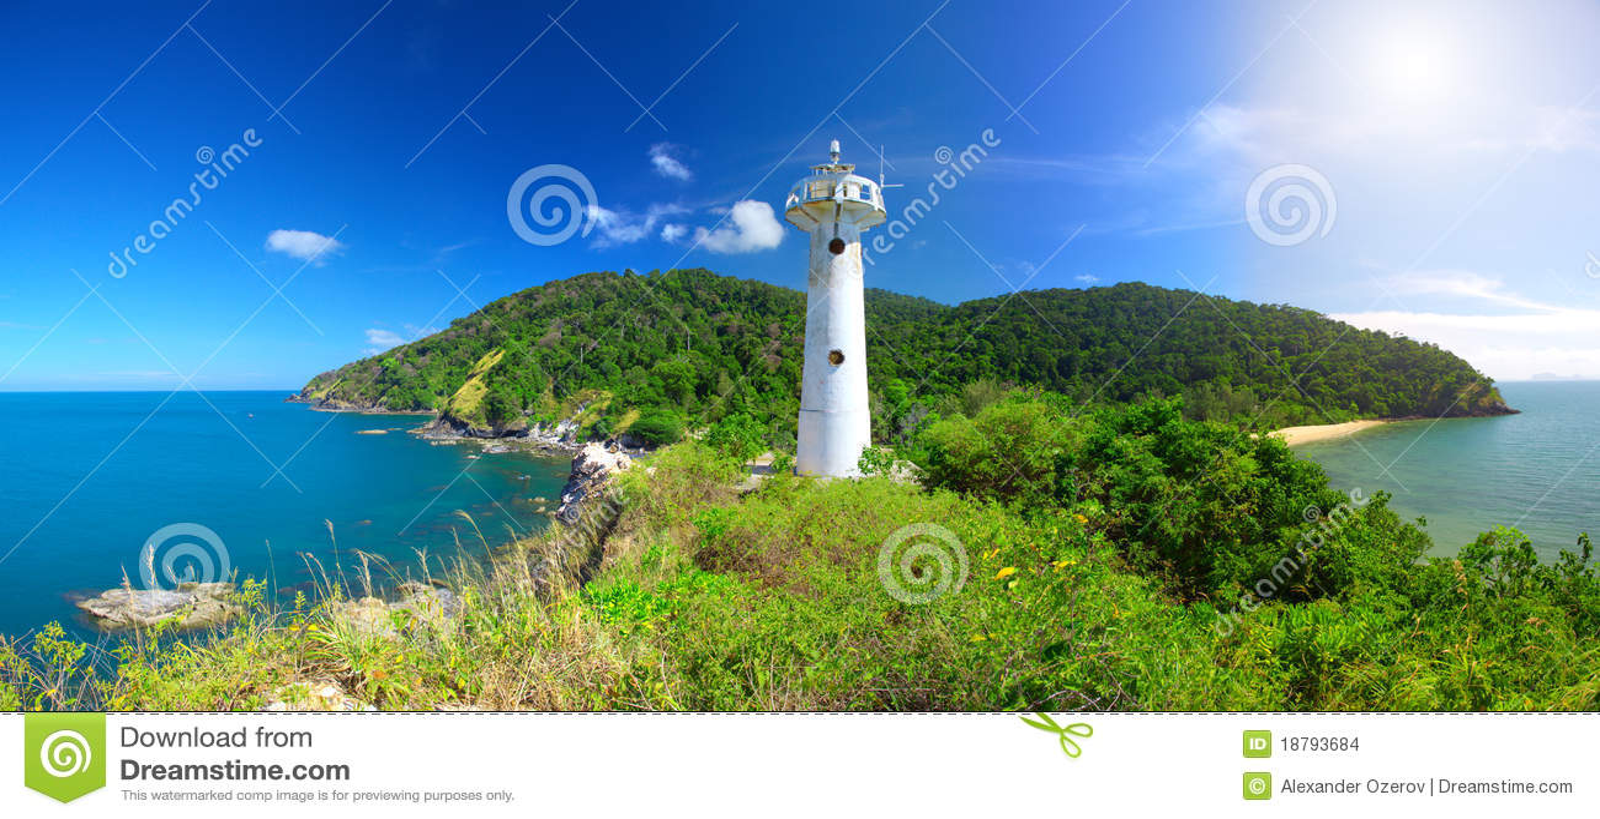 Lighthouse and National Park of Koh Lanta, Krabi,